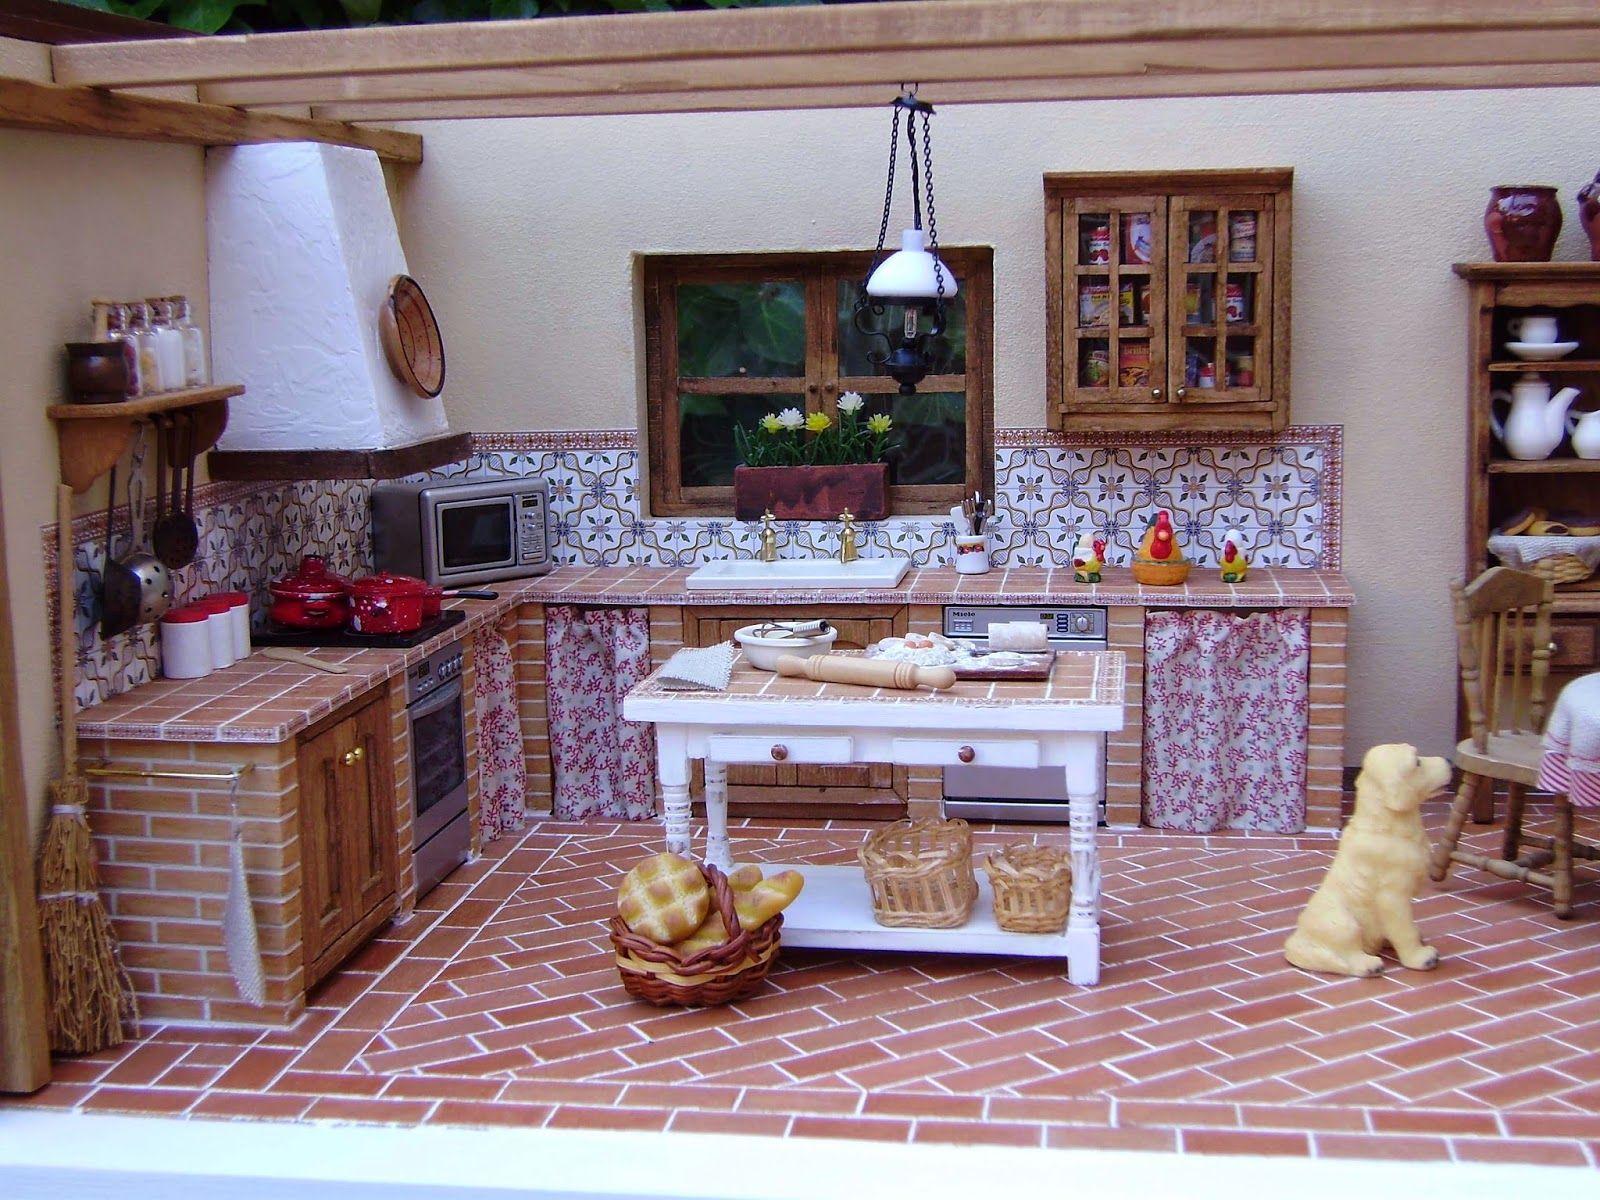 Cocina de obra con dos hogares buscar con google - Cocinas de obra rusticas ...